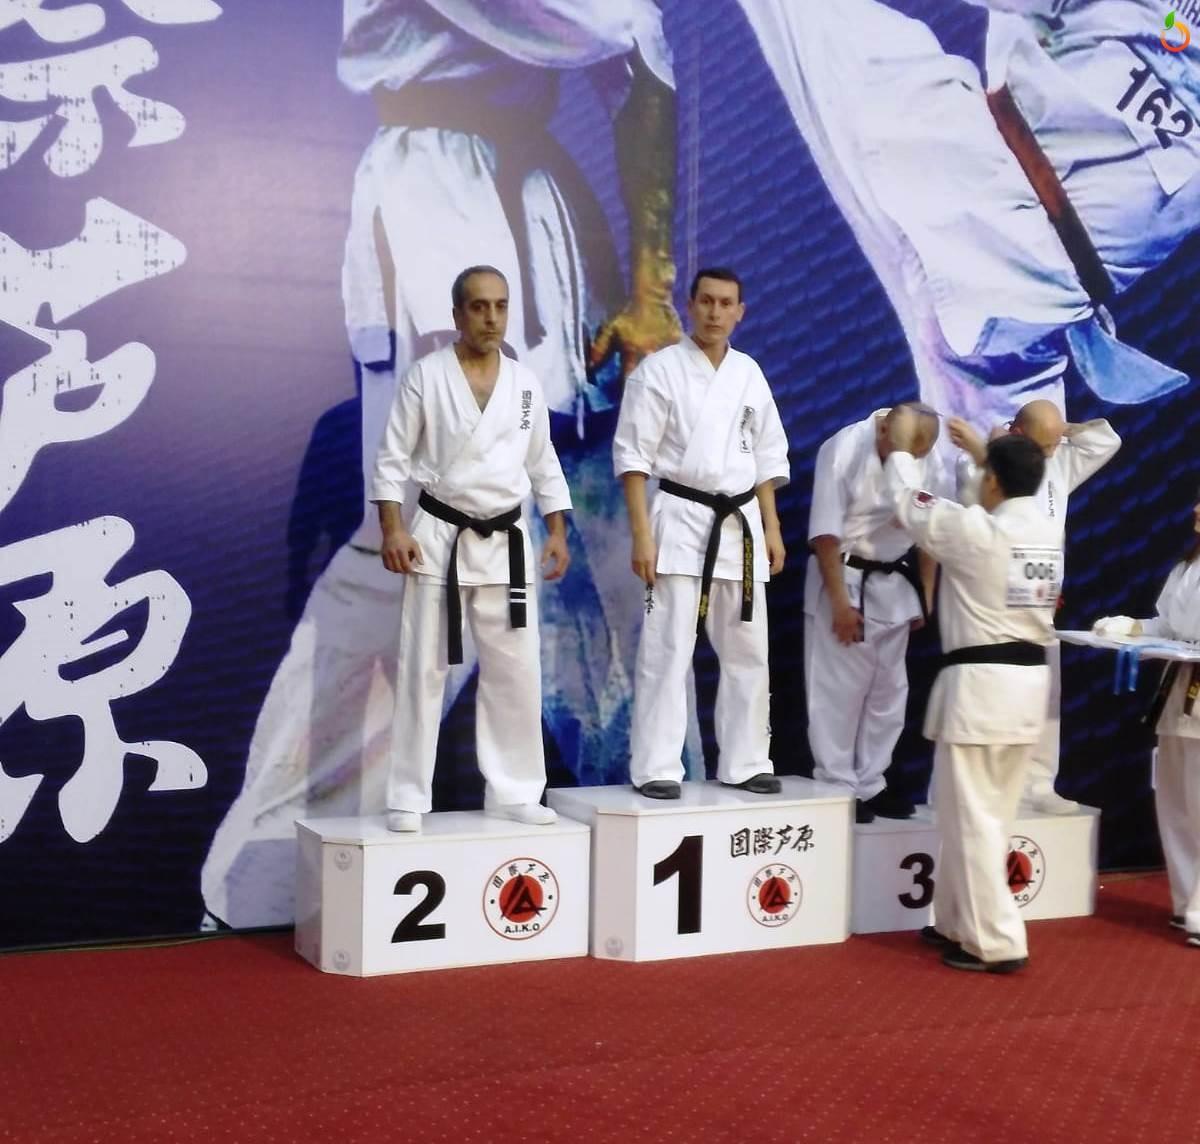 Ali Zafer Wushu Avrupa Şampiyonu Oldu!